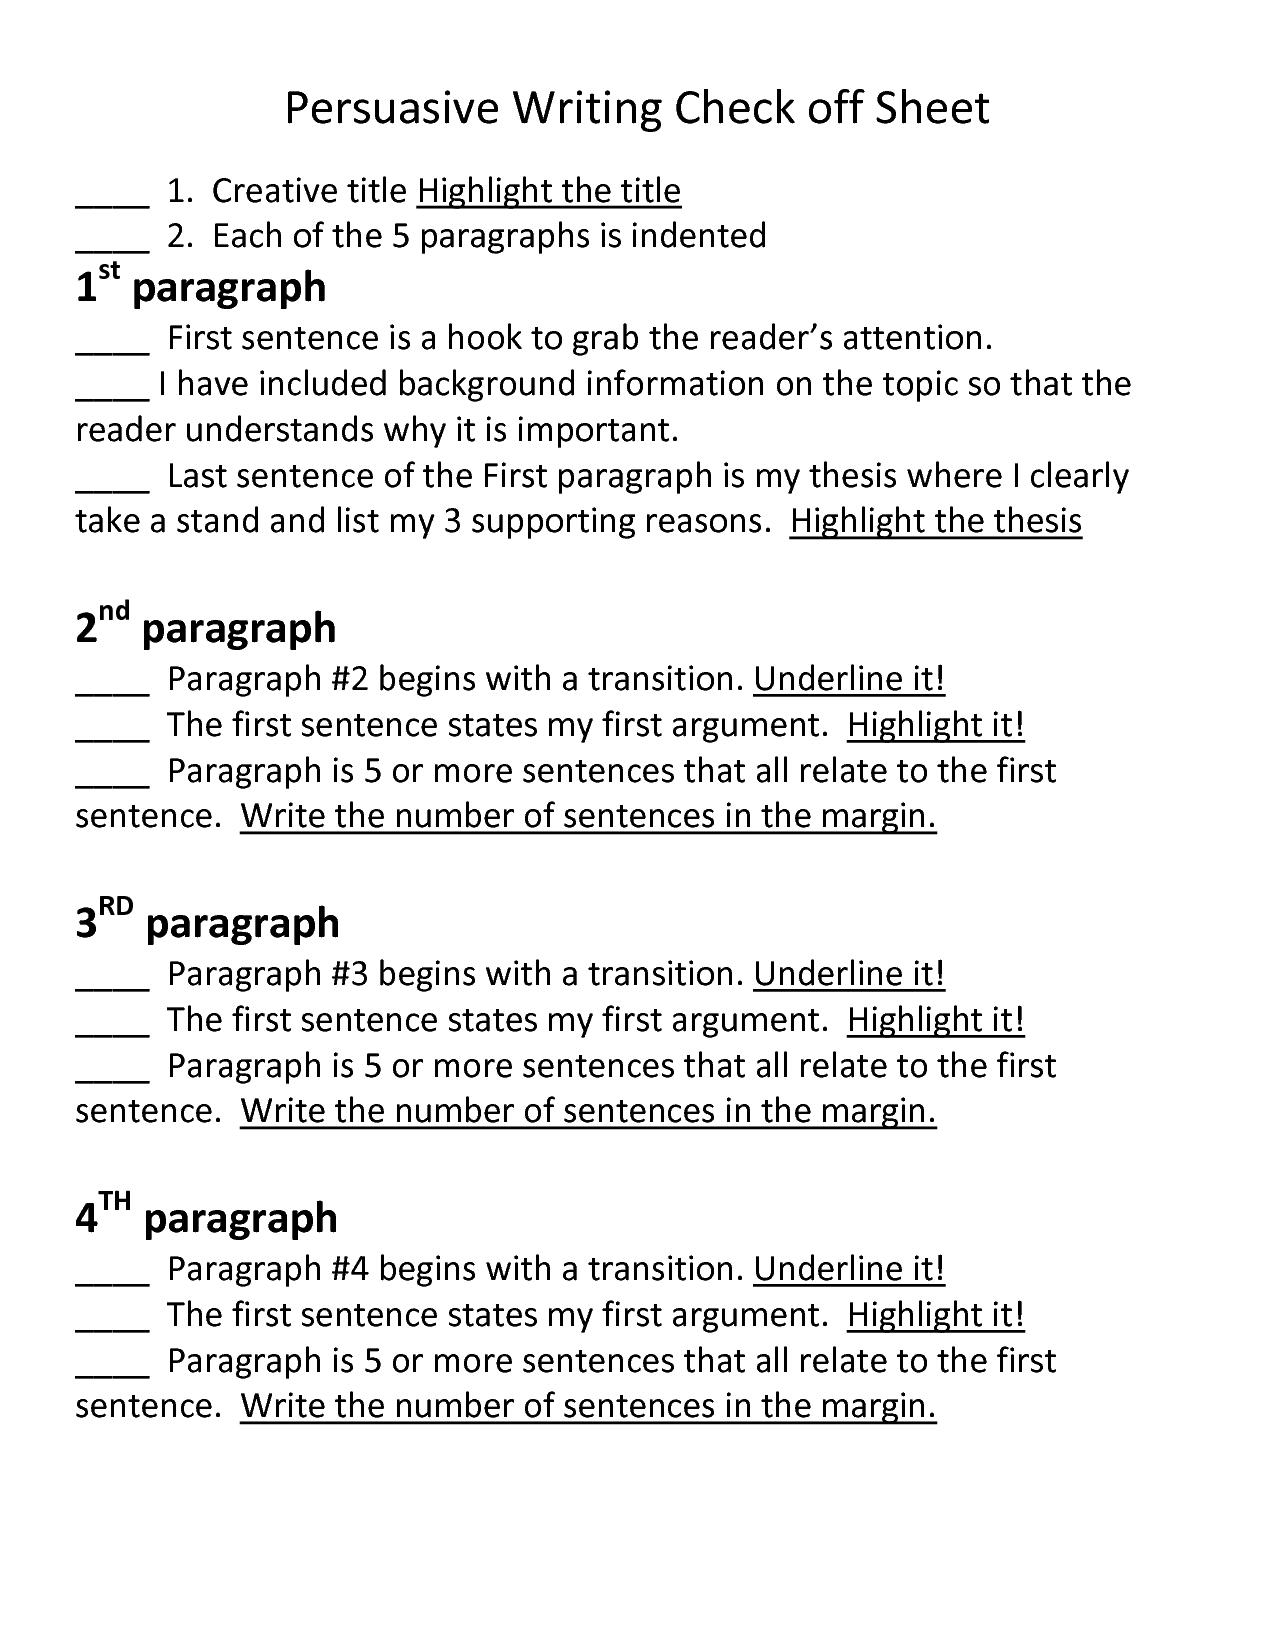 008 Paragraph Essay Example Top 3 Writing Narrative Sample